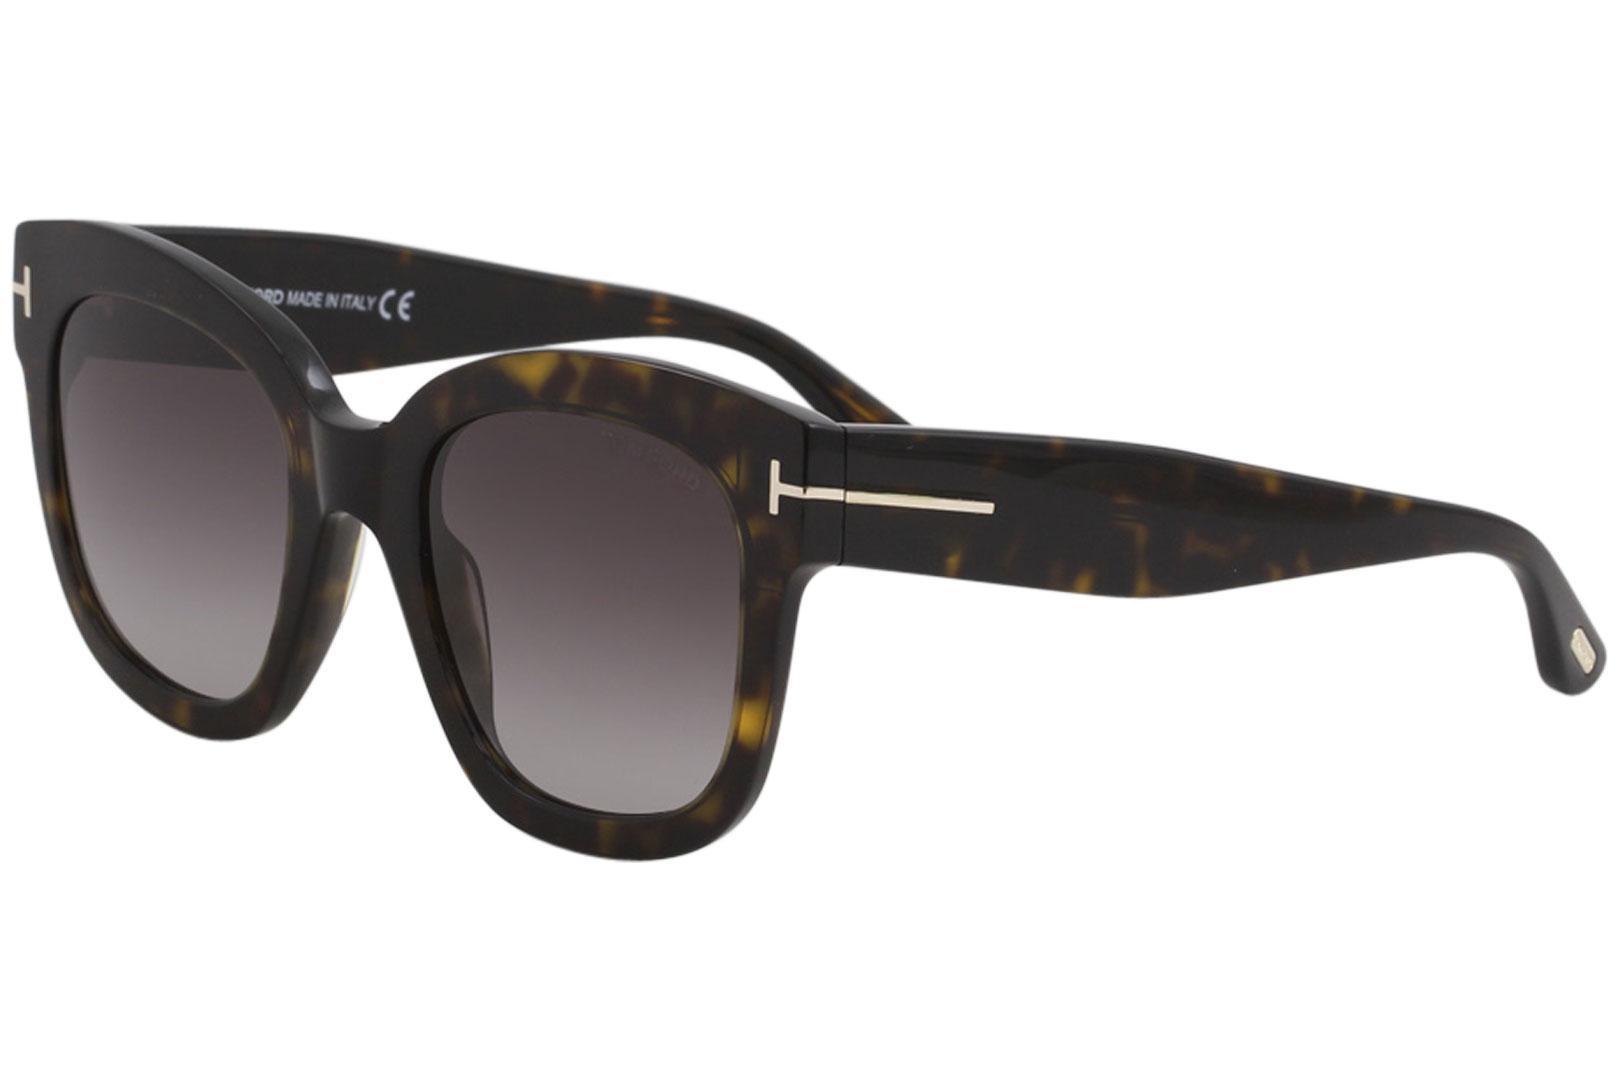 26c39d48976db Tom Ford Women s Beatrix-02 TF613 TF 613 Fashion Square Sunglasses